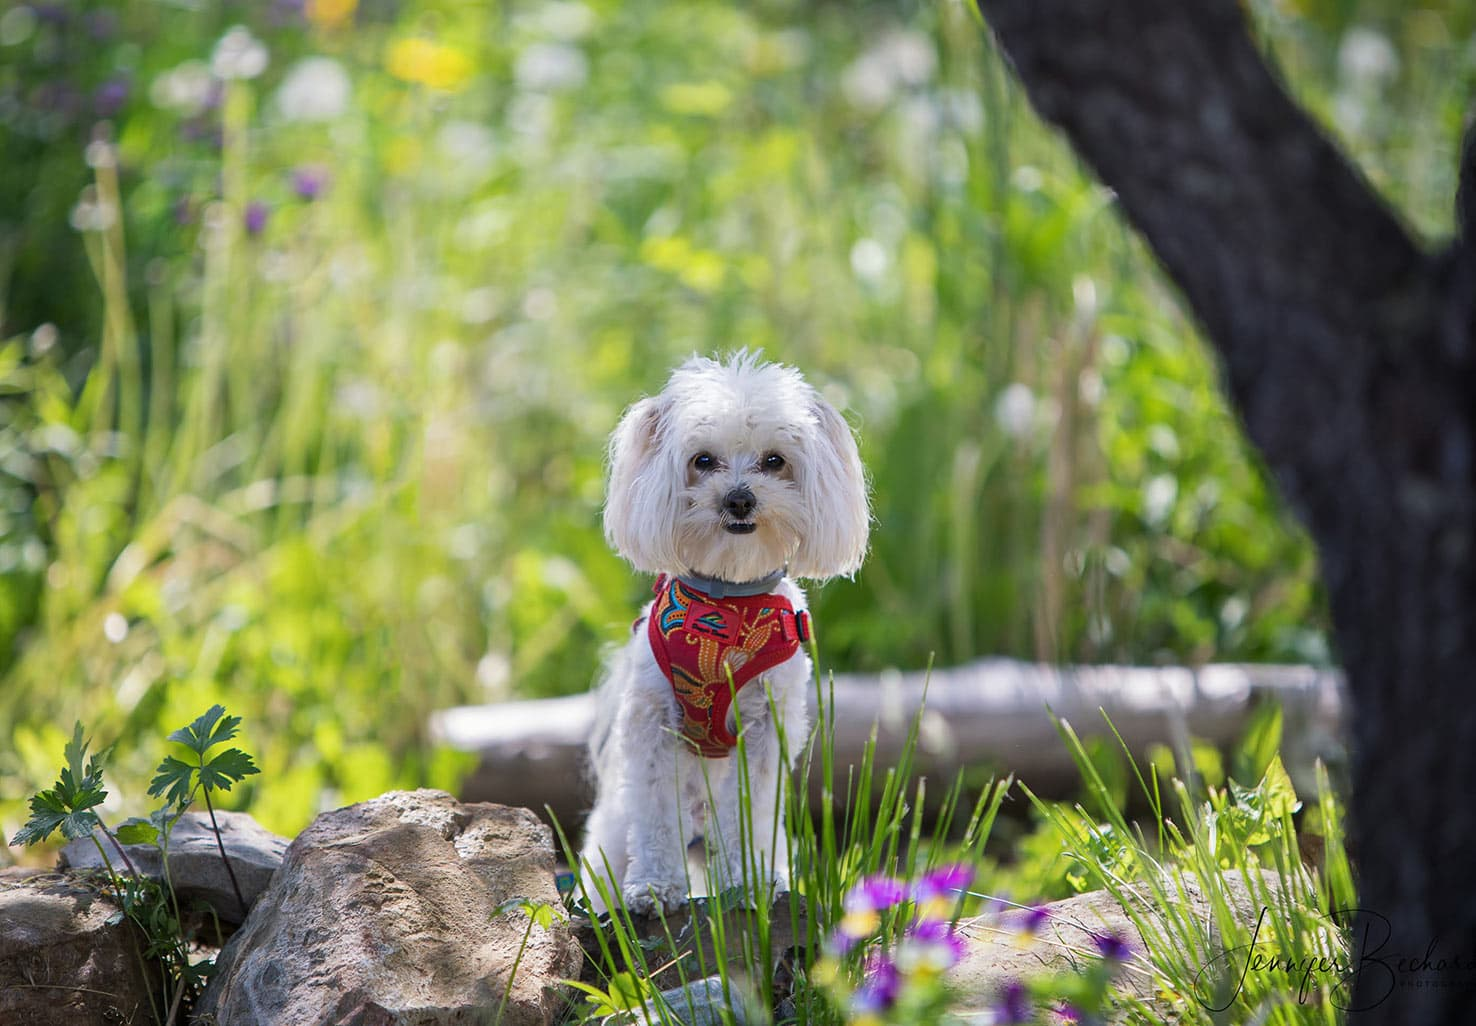 Cute small dog in Hartstone Inn Gardens